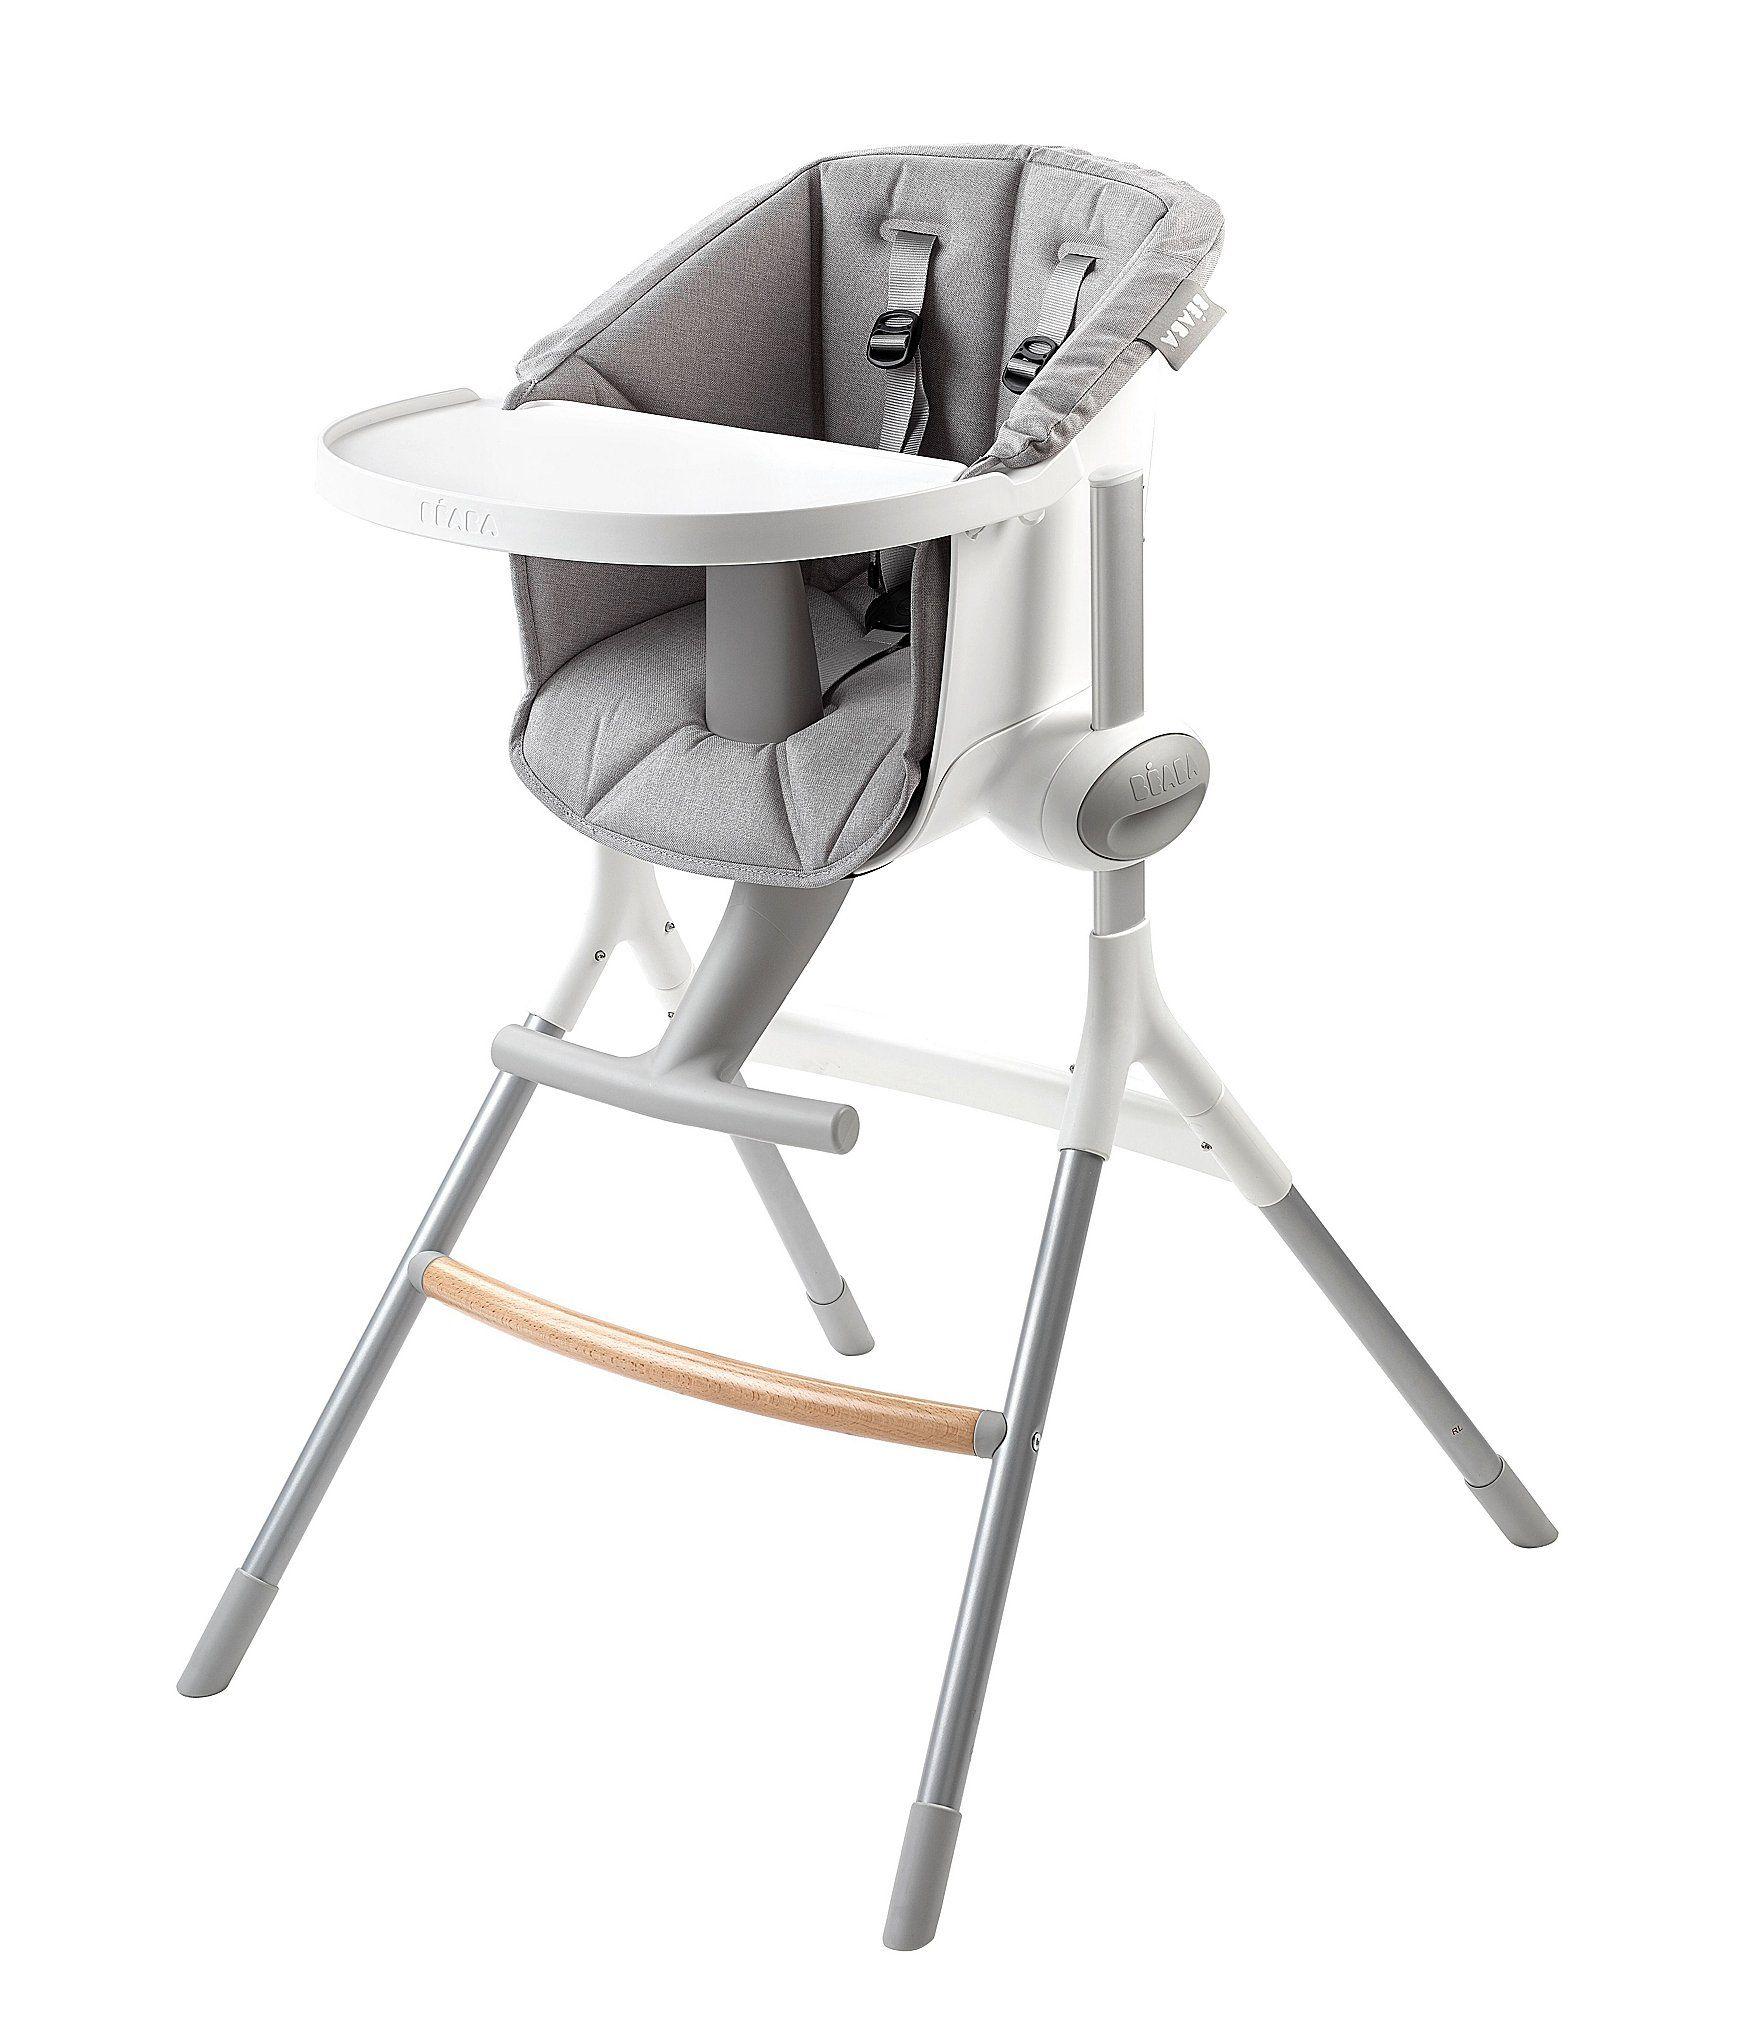 Beaba Up Down High Chair Dillard S In 2020 Baby High Chair High Chair Chair